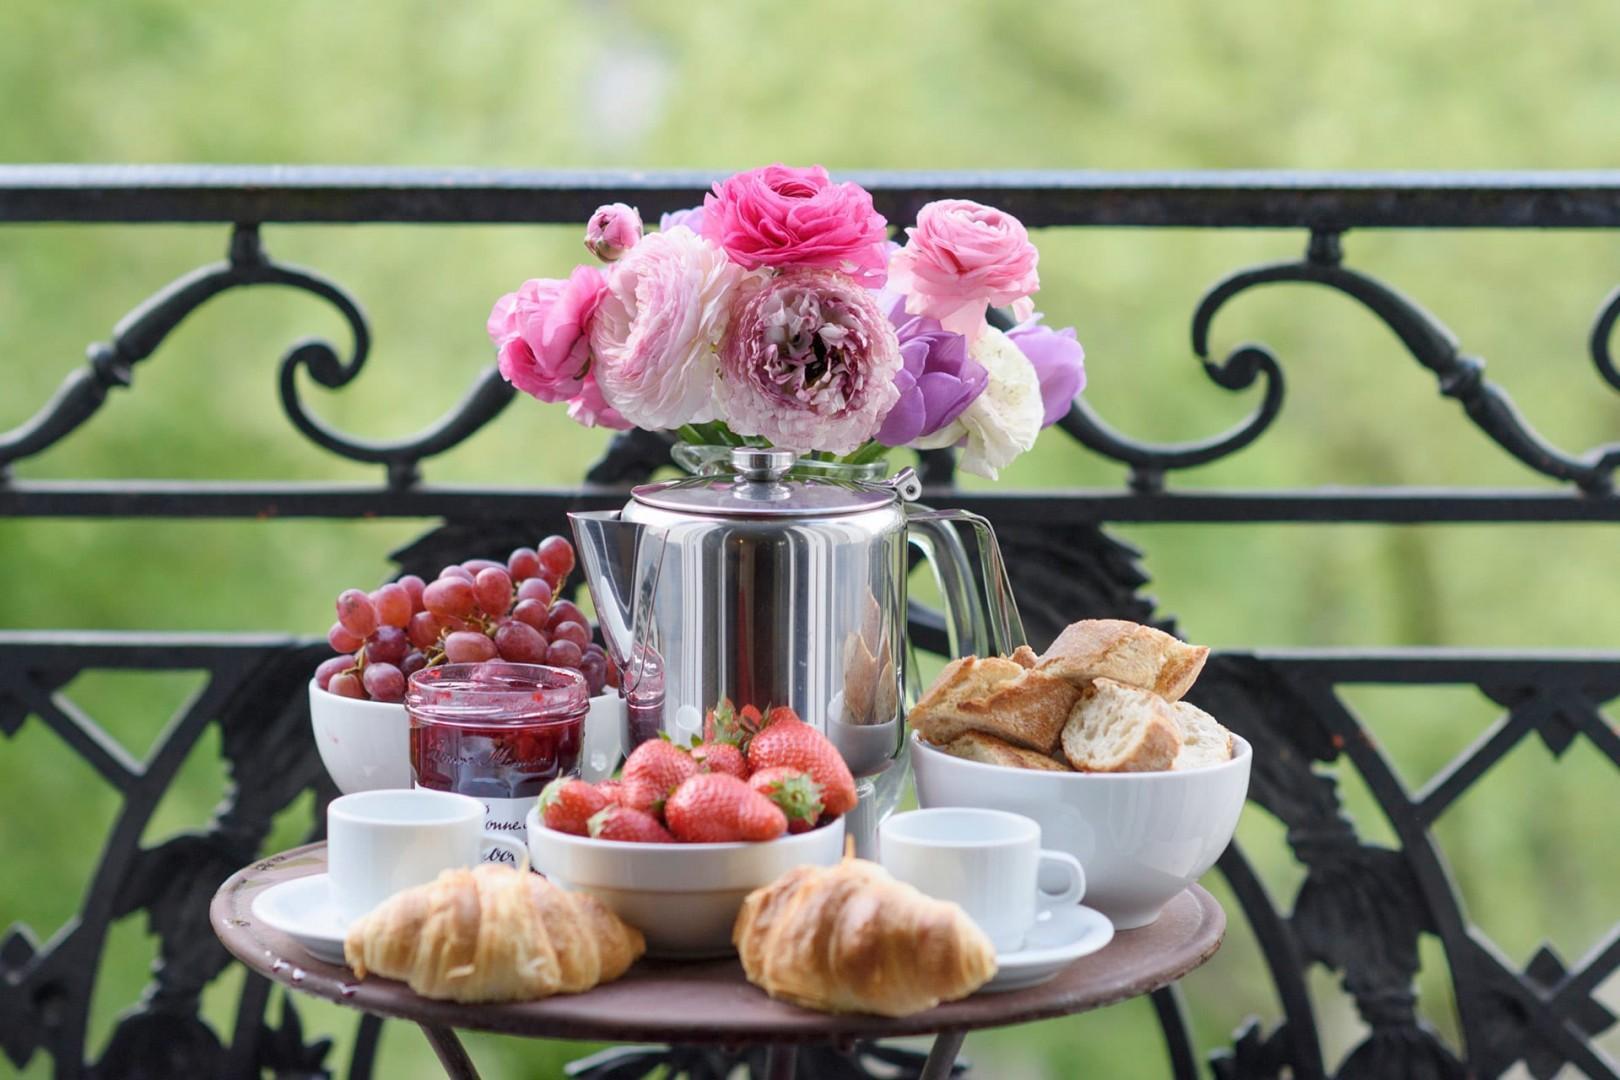 Treat yourself to breakfast al fresco on your balcony.